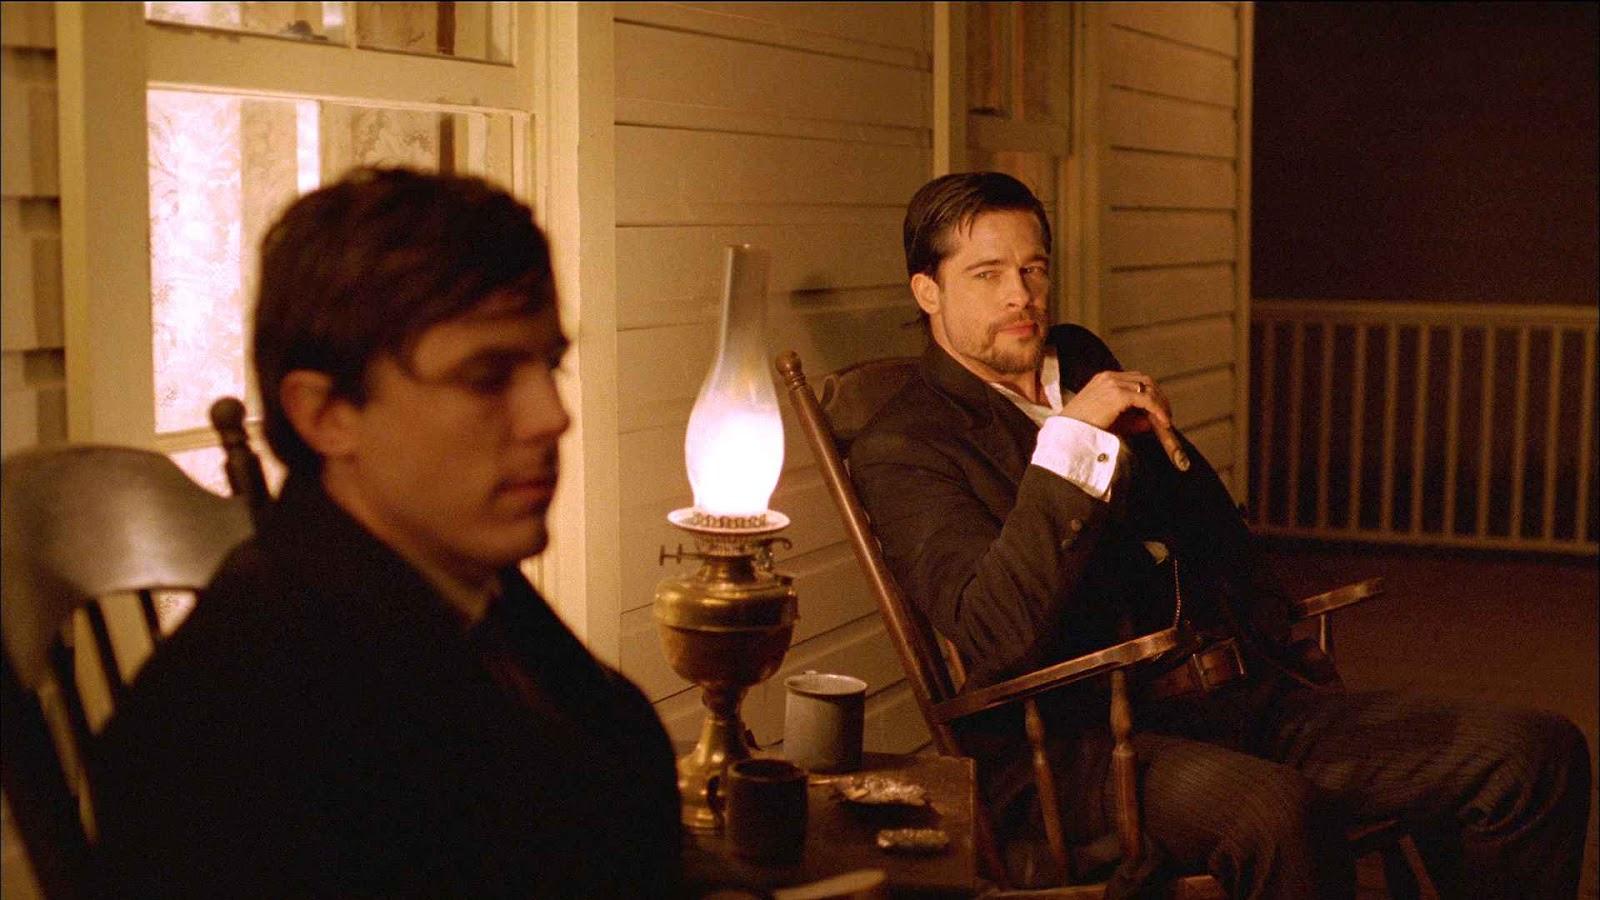 http://2.bp.blogspot.com/-9TauipXvn4I/UD5Qk0R68iI/AAAAAAAADZg/A2QFwPAnlf8/s1600/brad-pitt-jesse-james-casey-affleck-robert-ford-the-assassination-of-jesse_james-by-the-coward-robert-ford.jpg